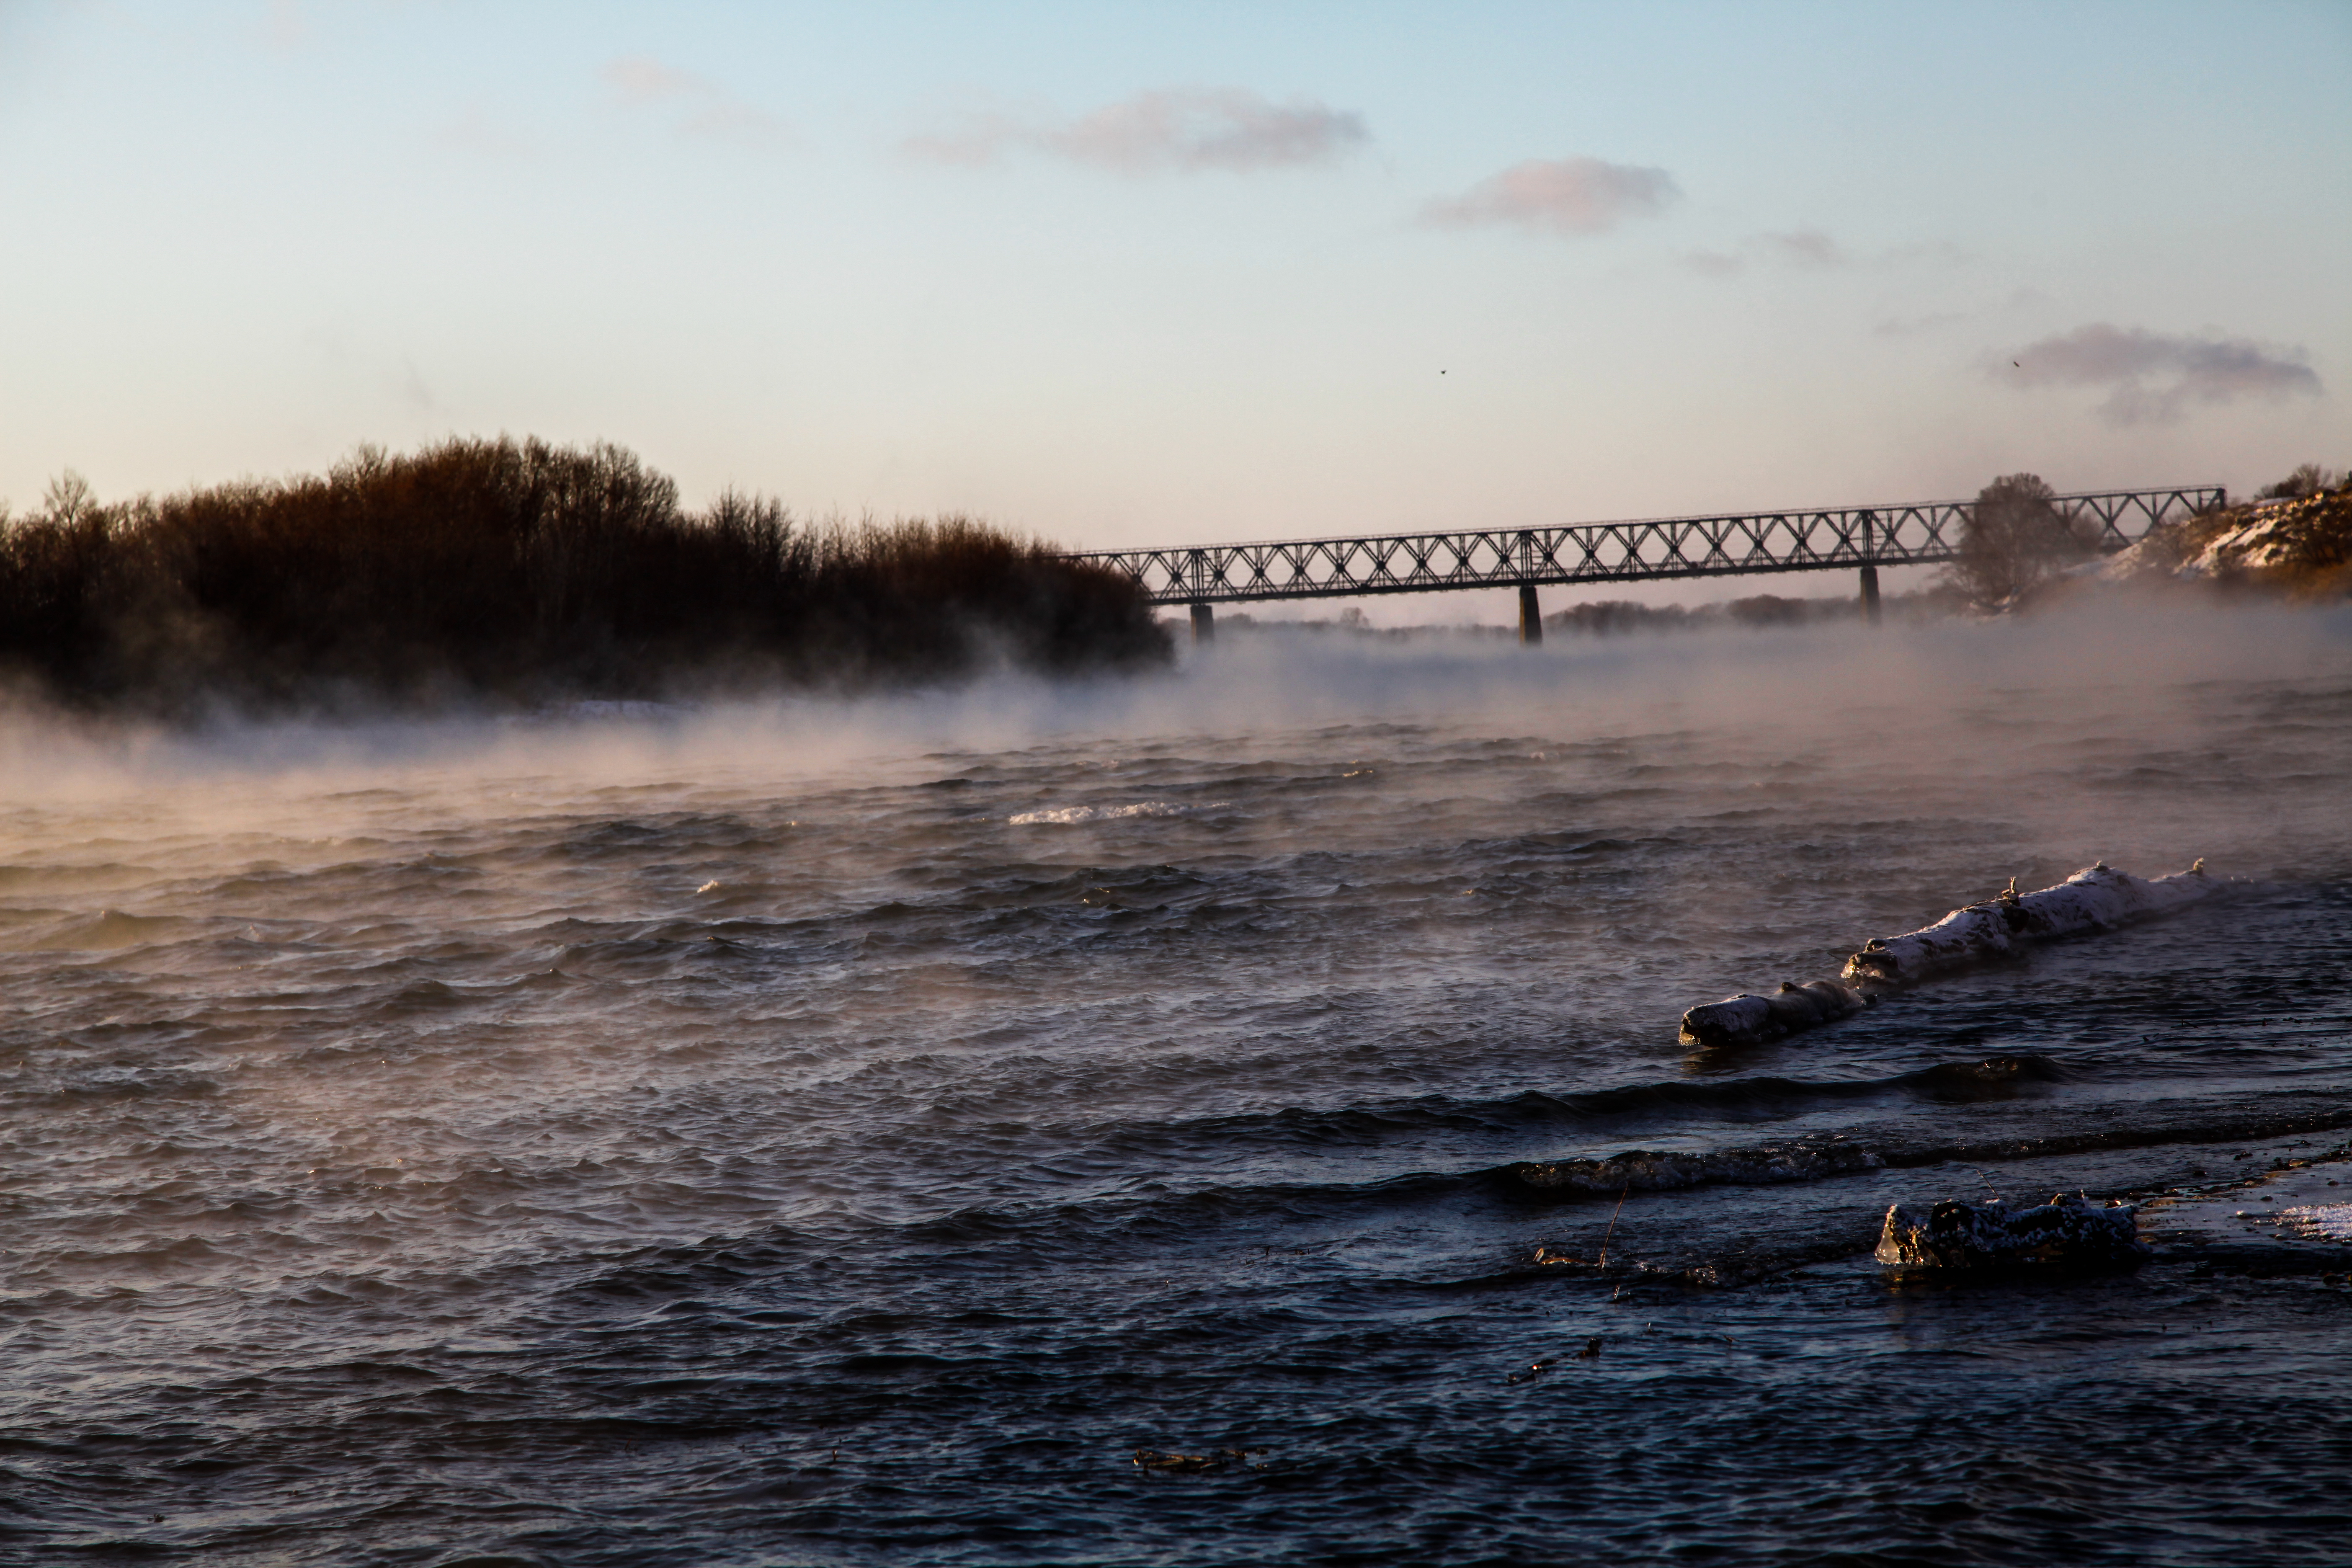 фото реки иртыш в казахстане собака сосиска или